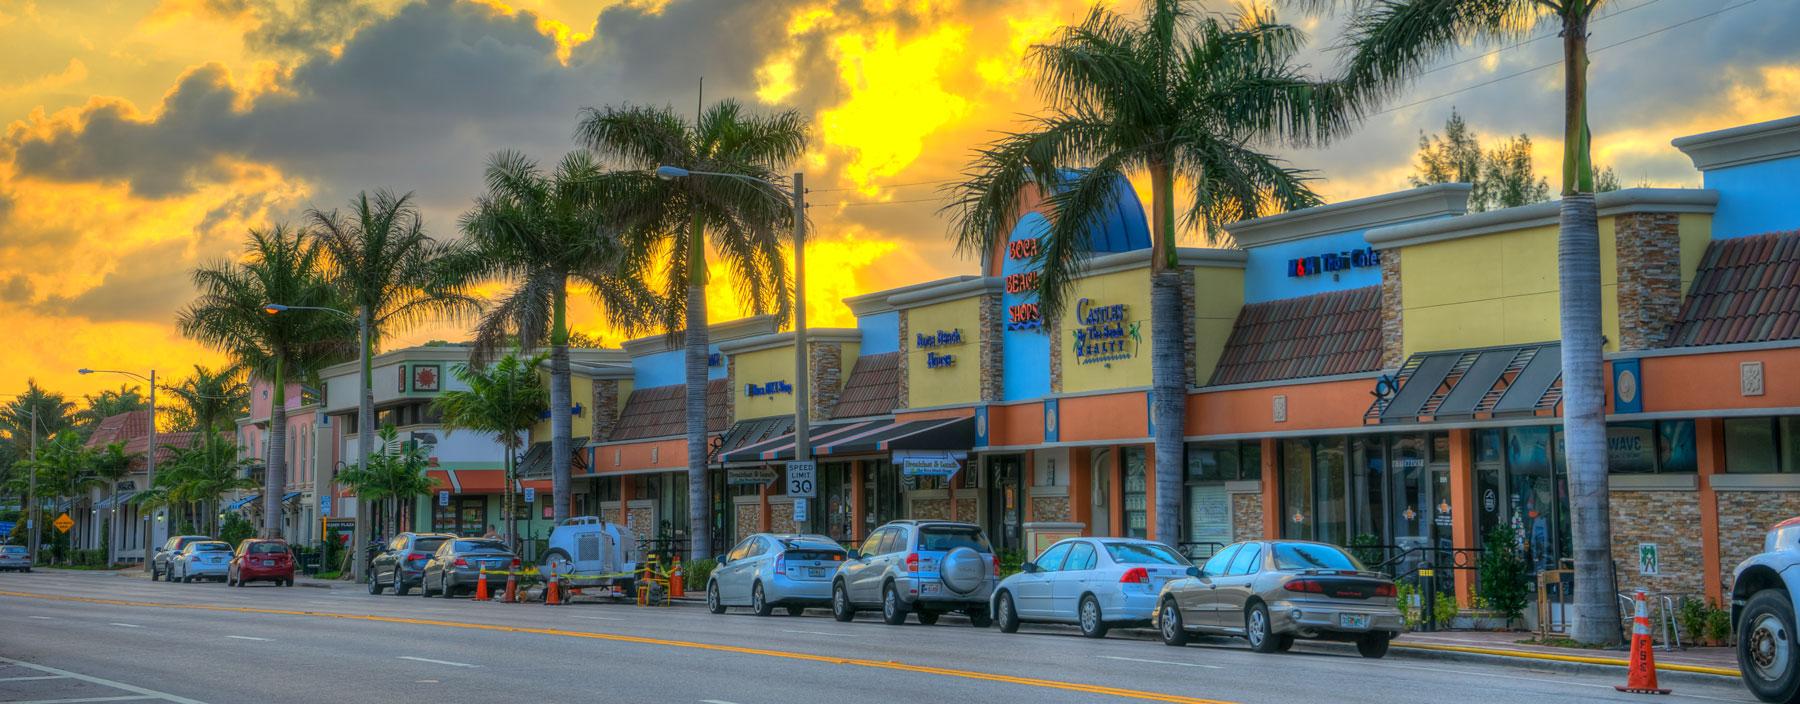 Boca-Raton-Sunset-Palmetto-Park-Road.jpg